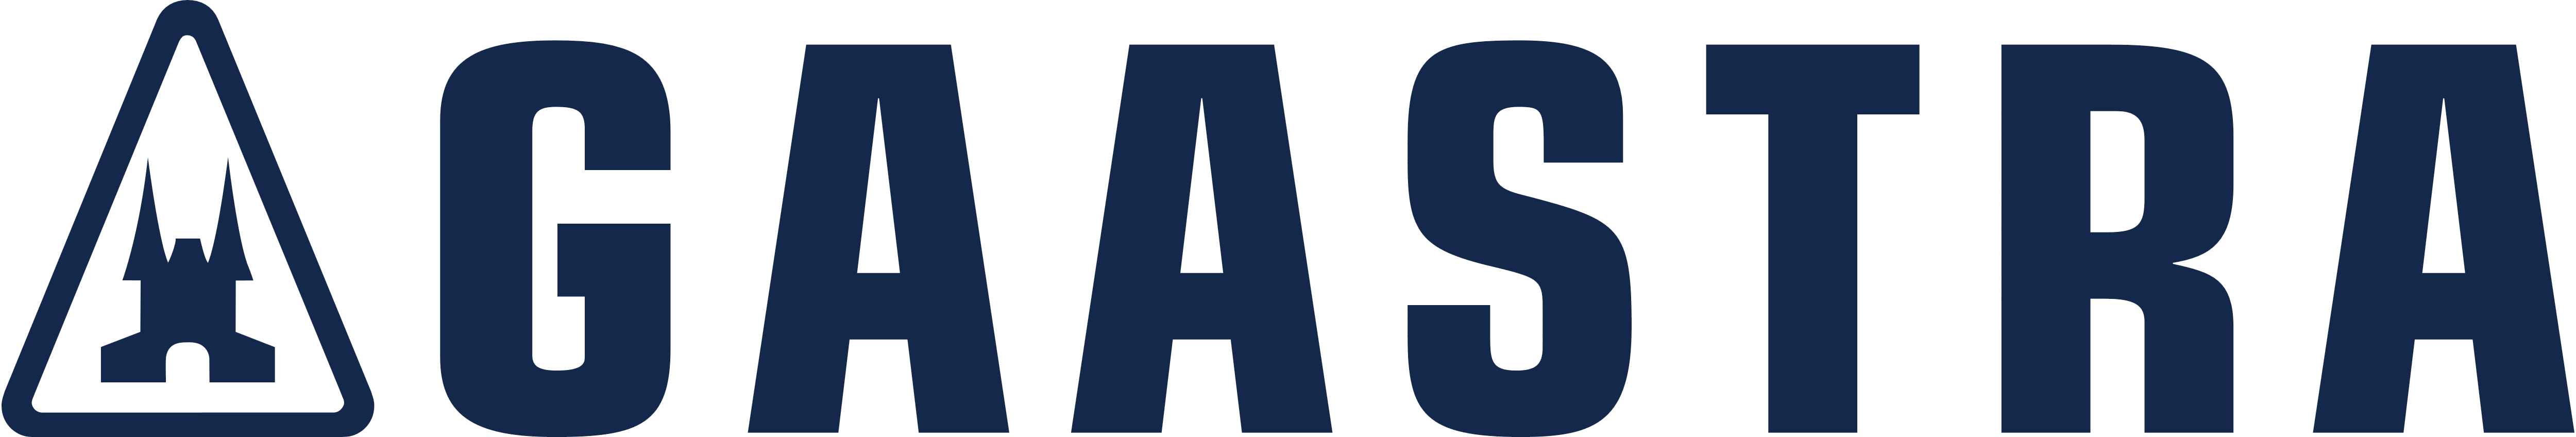 Gaastra Logos Download